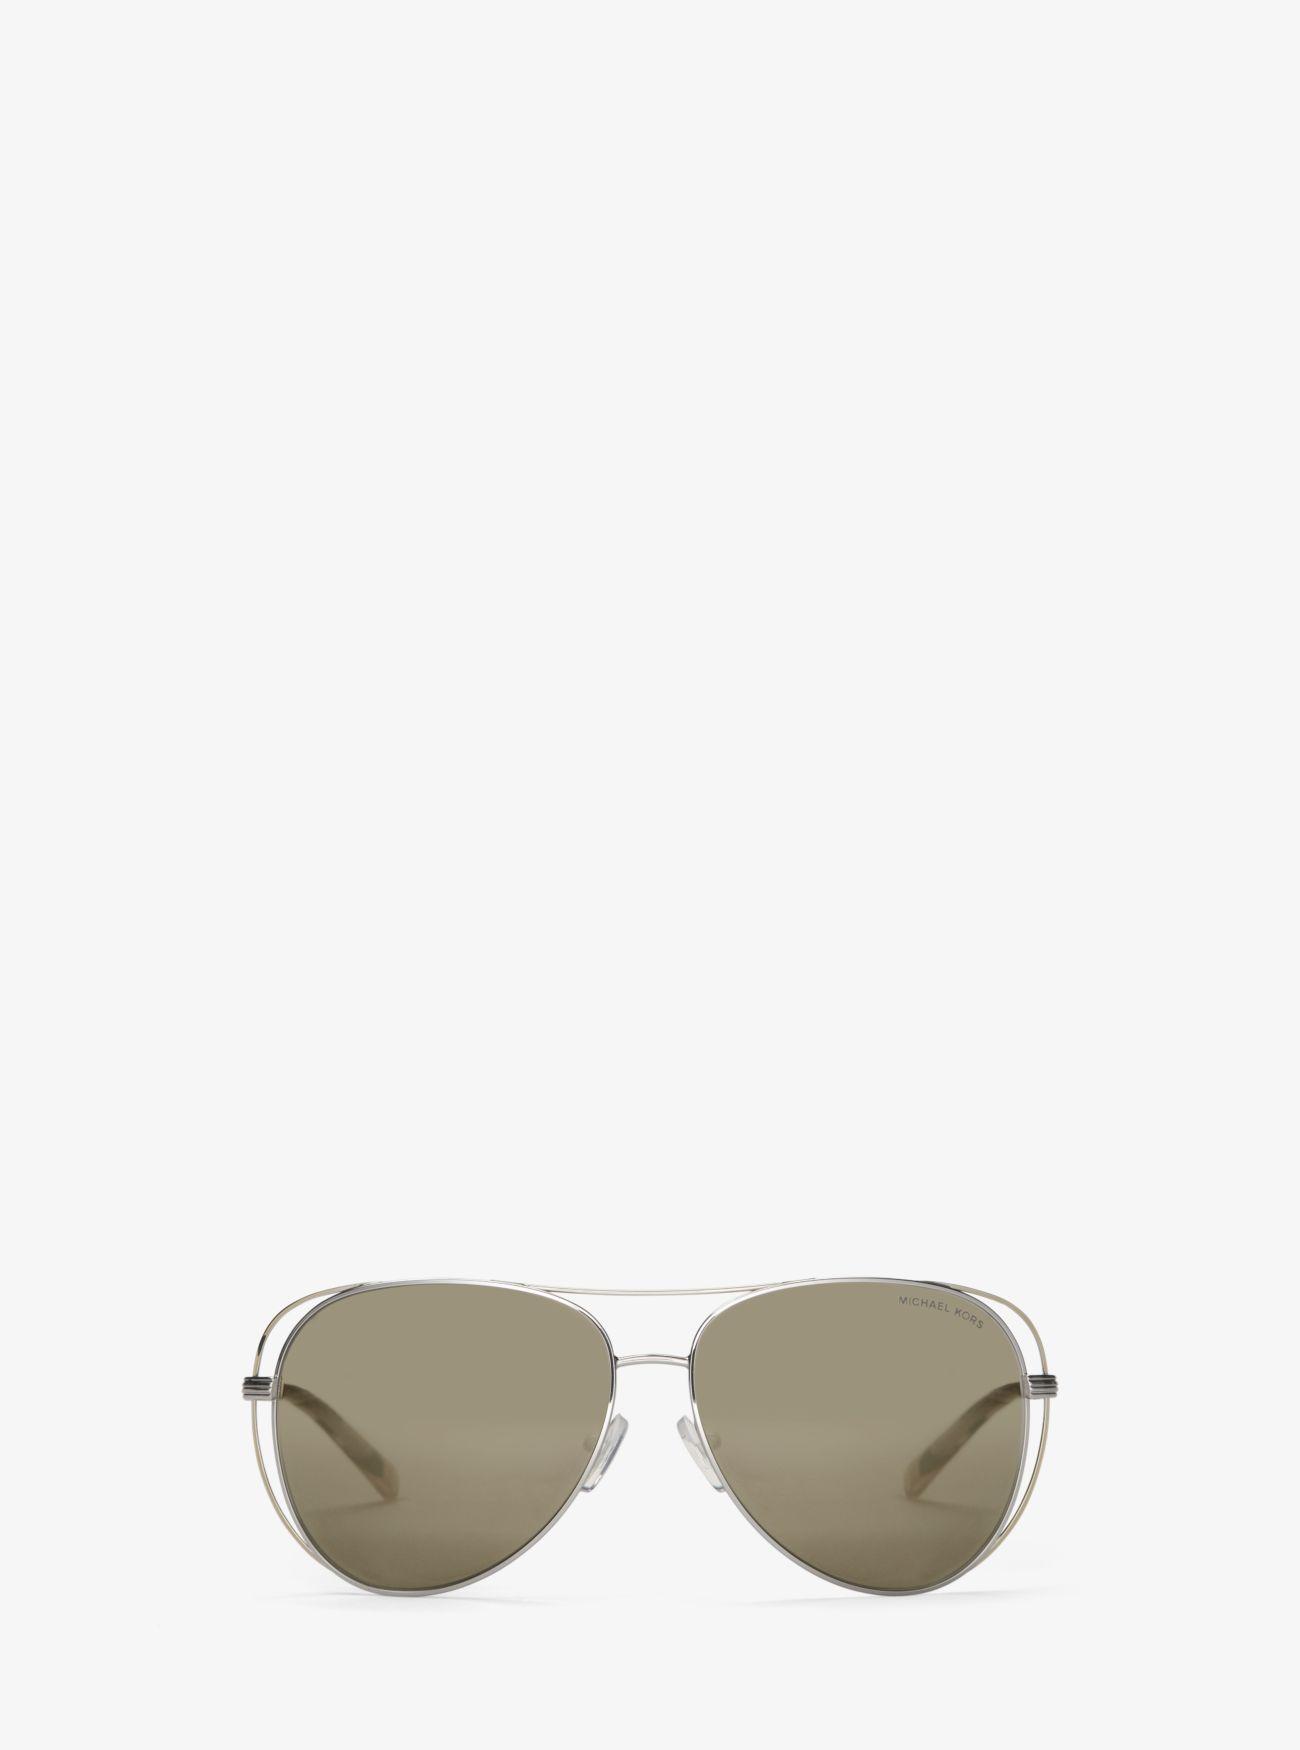 3946940028a7 Michael Kors - Multicolor Lai Sunglasses - Lyst. View fullscreen